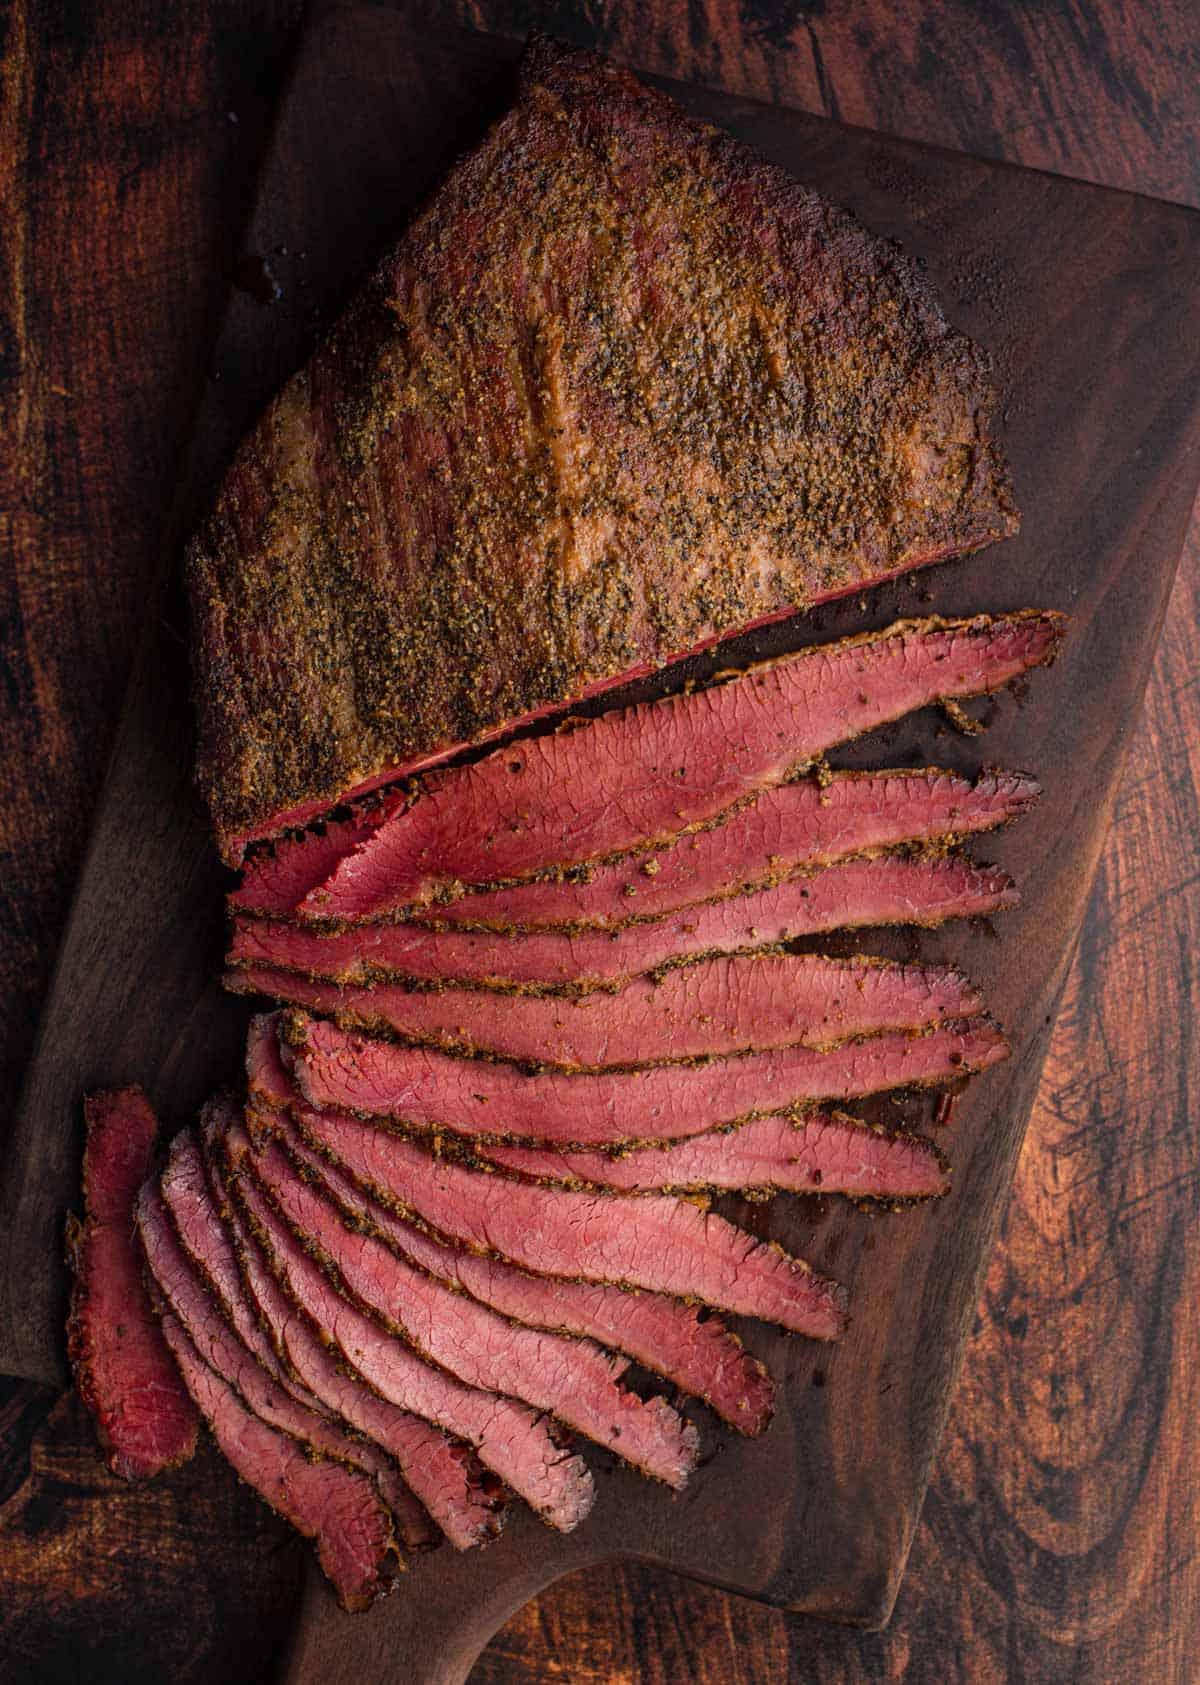 Smoked Corned Beef Brisket Flat on cutting board sliced.